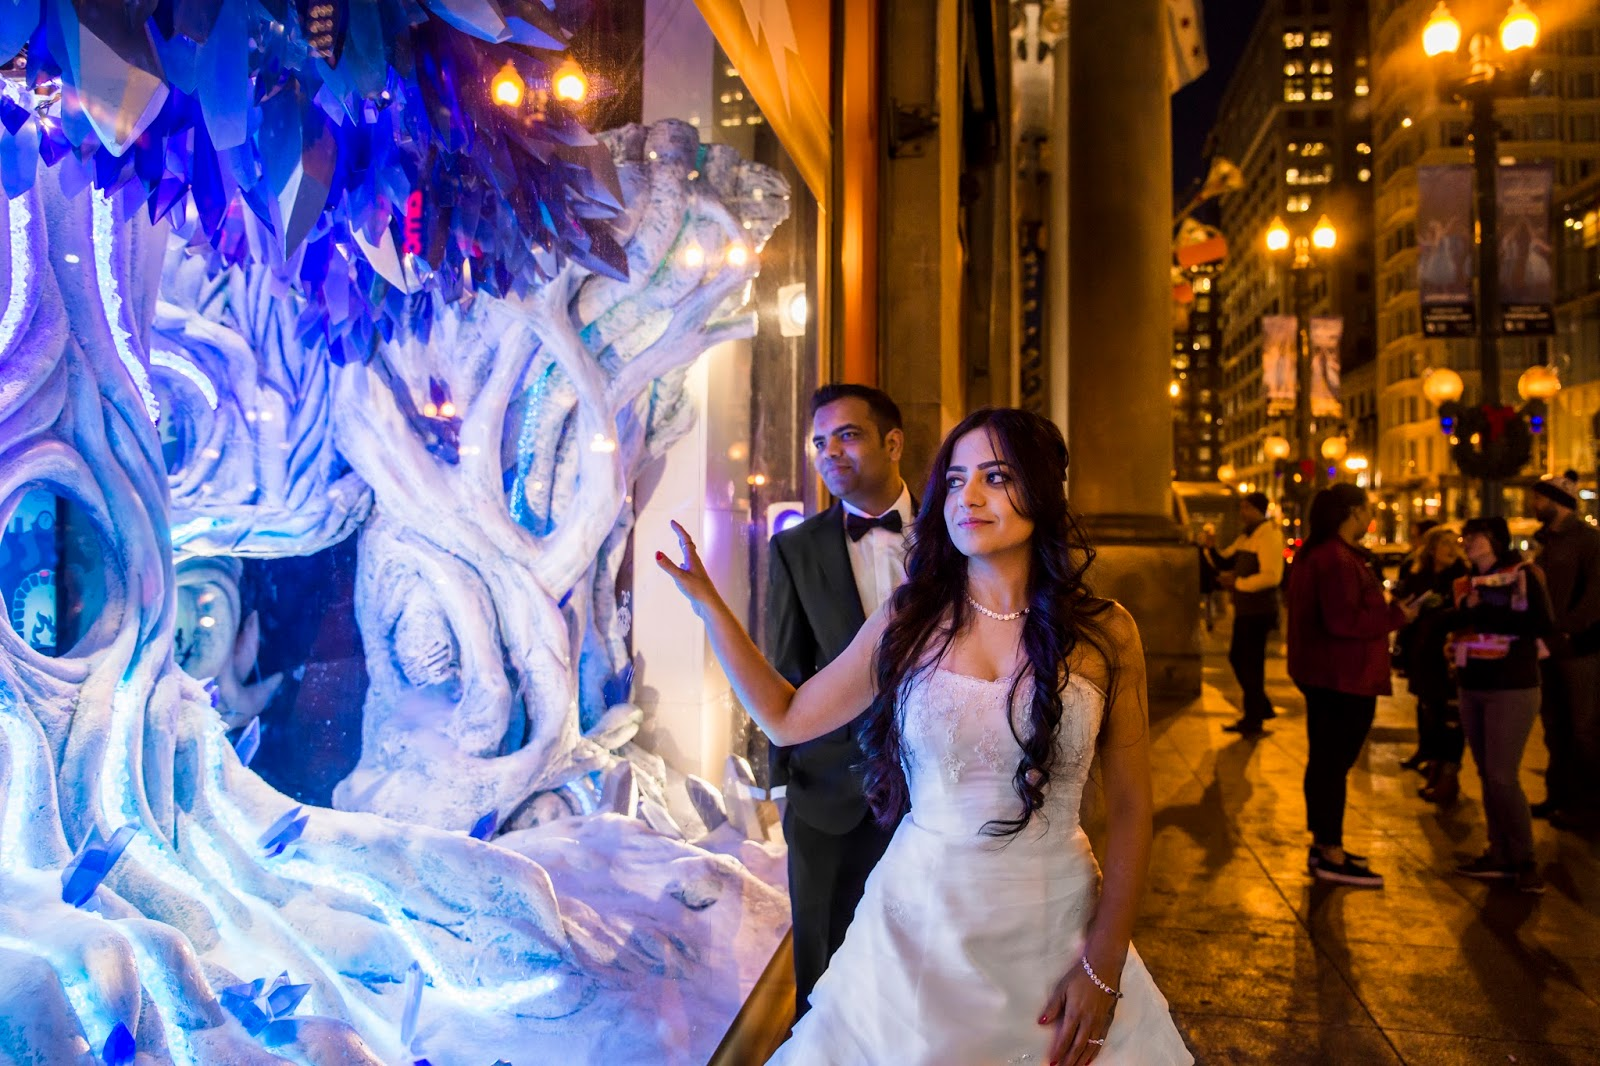 wedding poses ideas